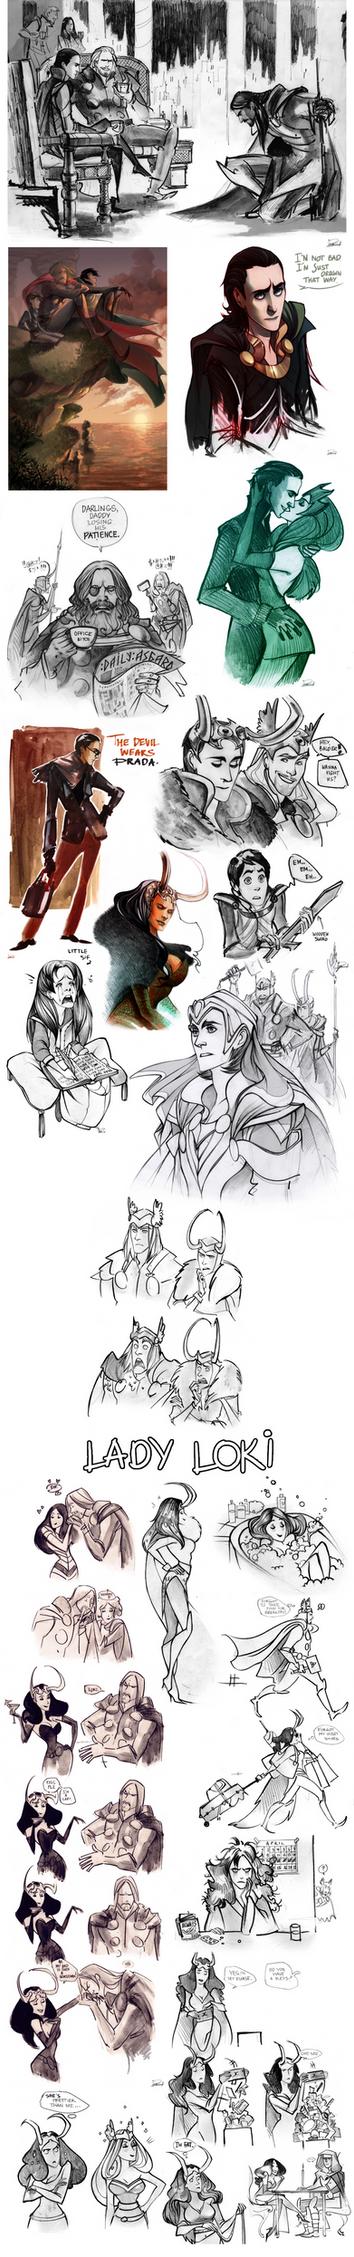 Thor sketchdump II by Phobs